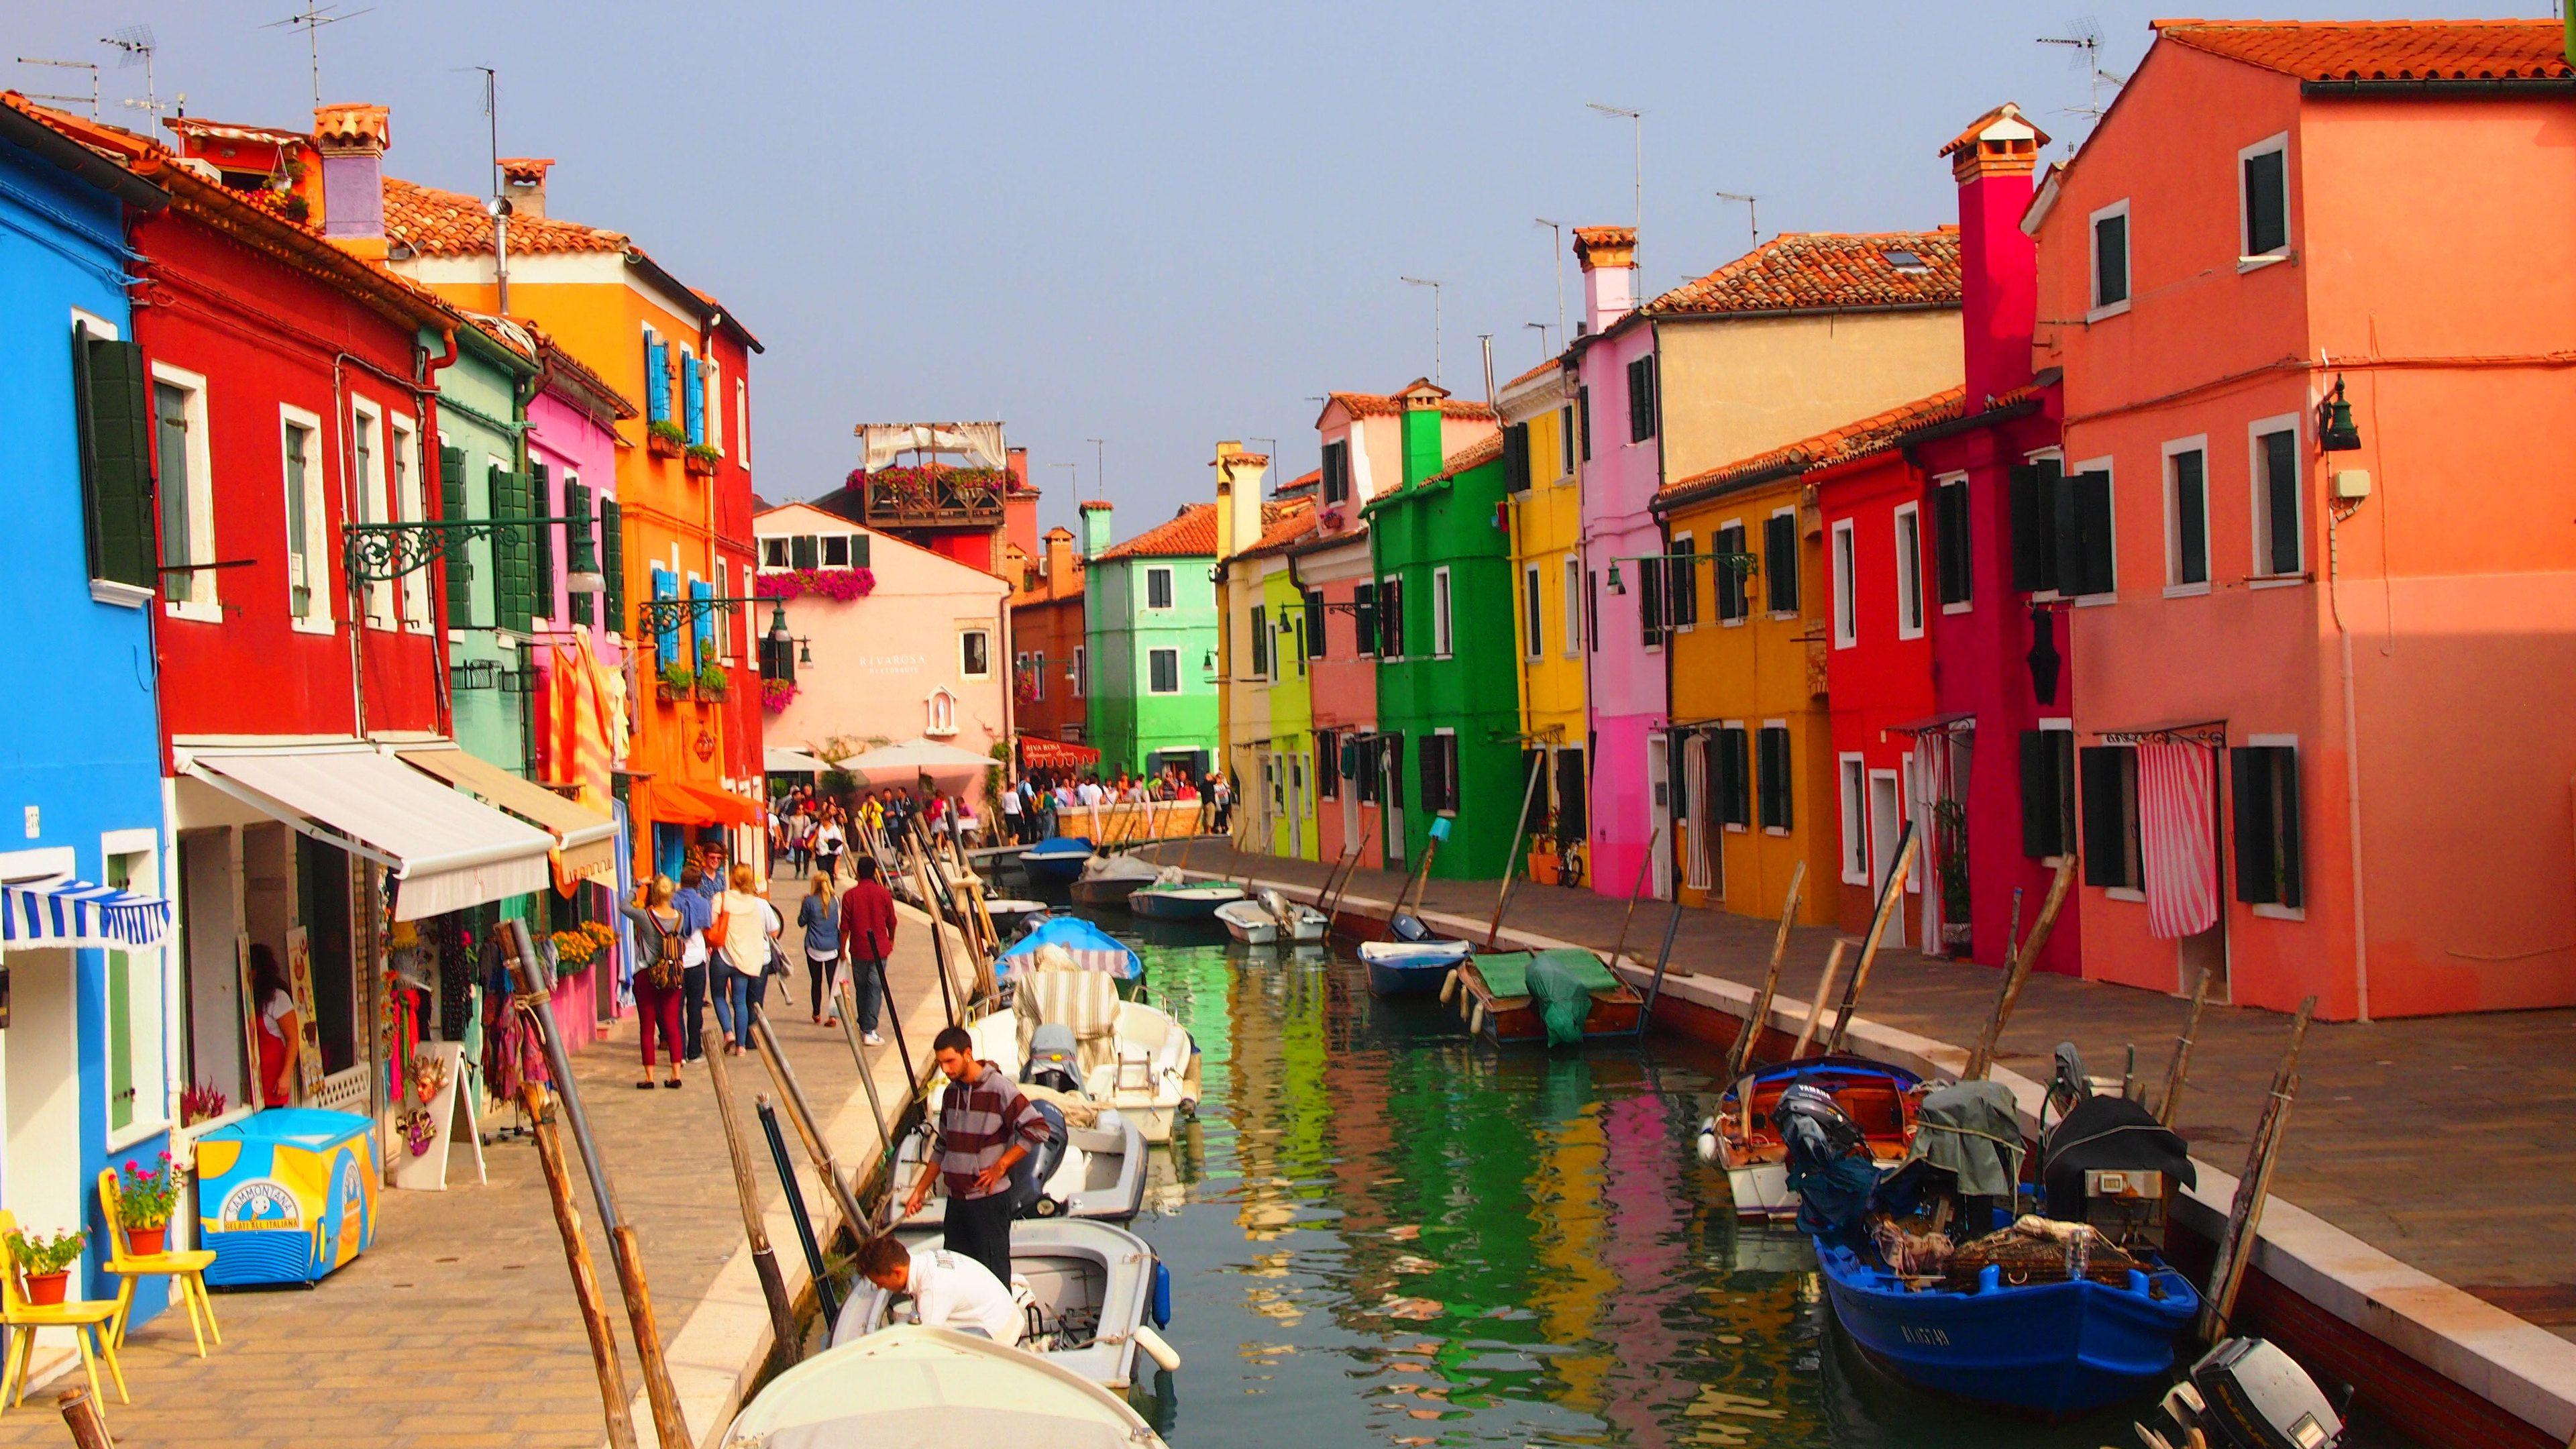 Venetian Islands Tour: Murano, Burano & Torcello